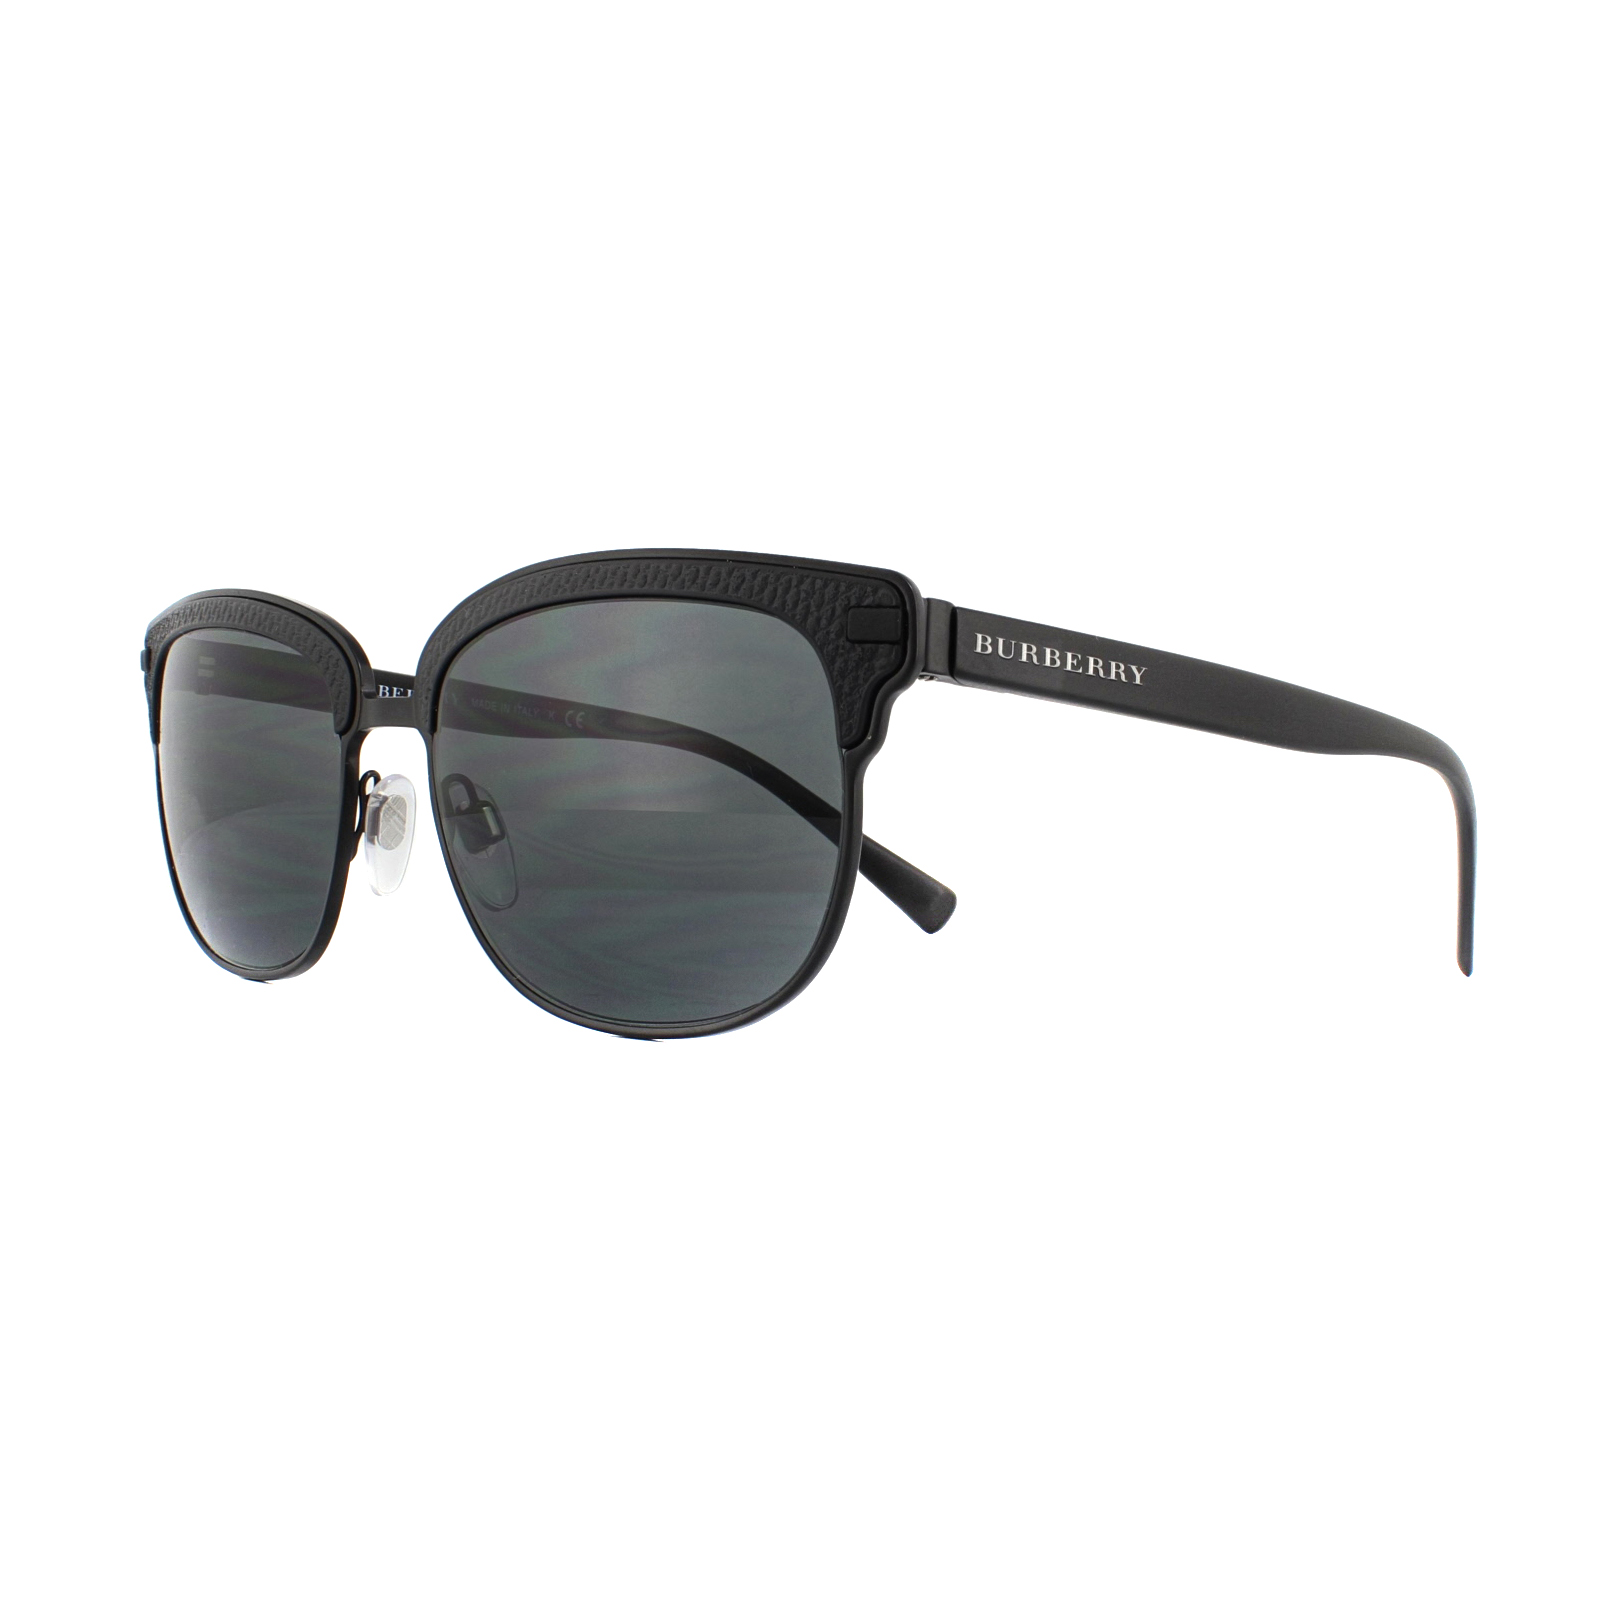 f9bb1ac883ac Sentinel Burberry Sunglasses BE4232 346487 Black Rubber Matte Black Grey